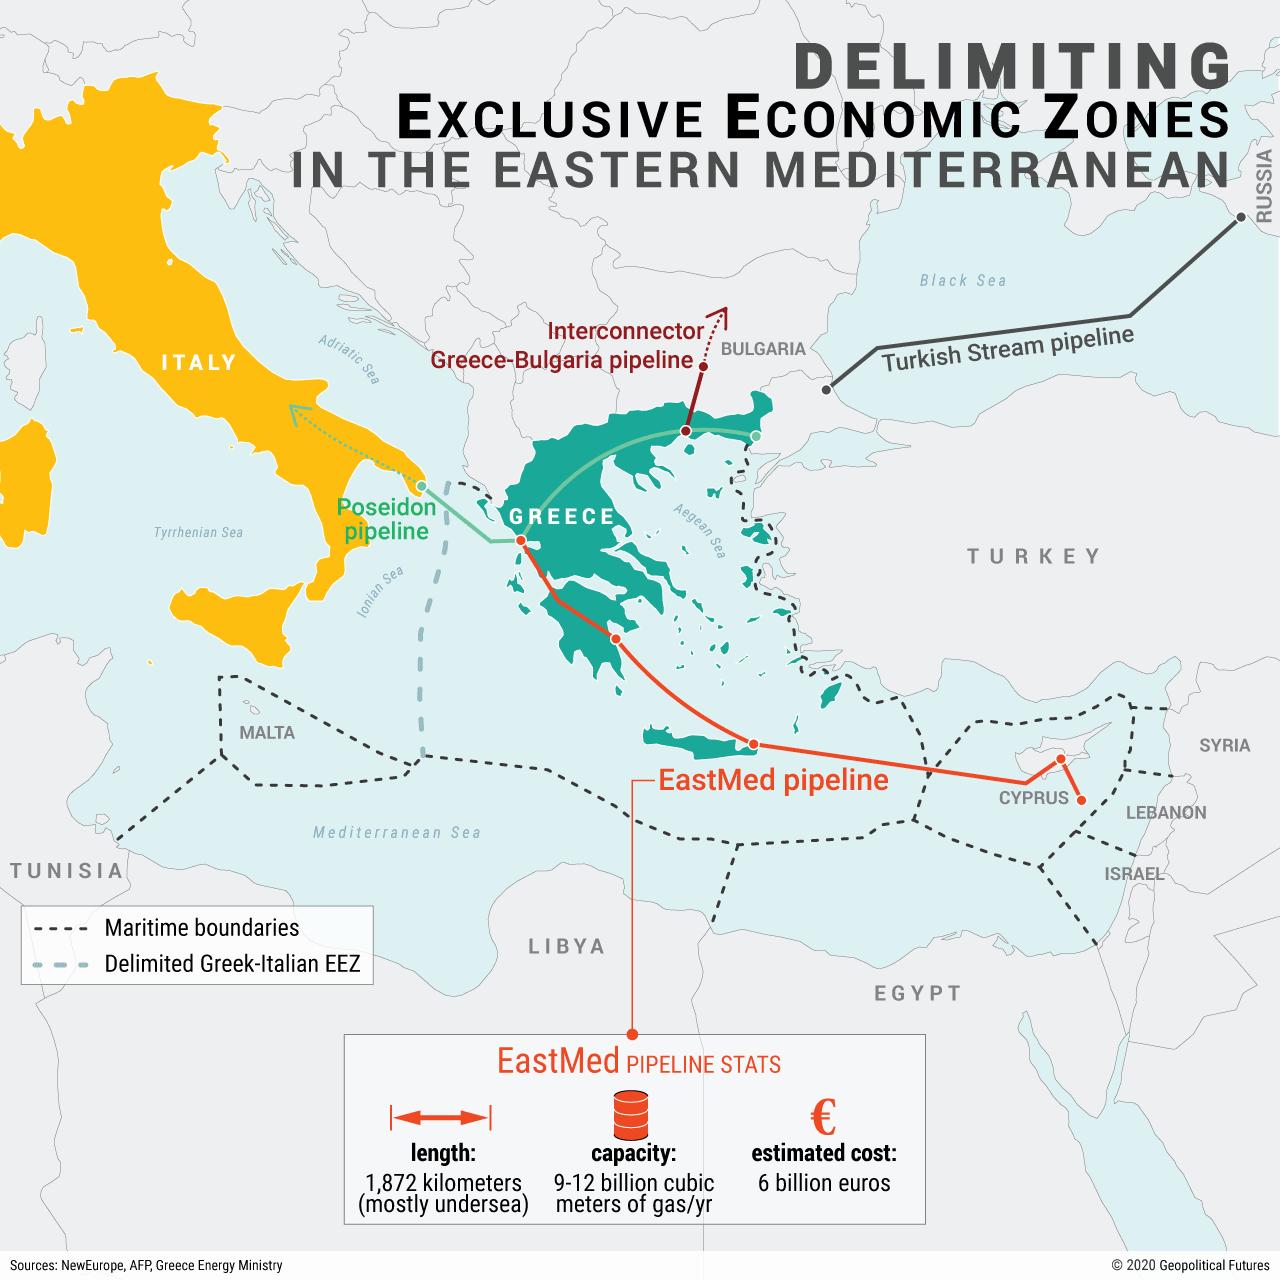 Delimiting Exclusive Economic Zones in the Eastern Mediterranean